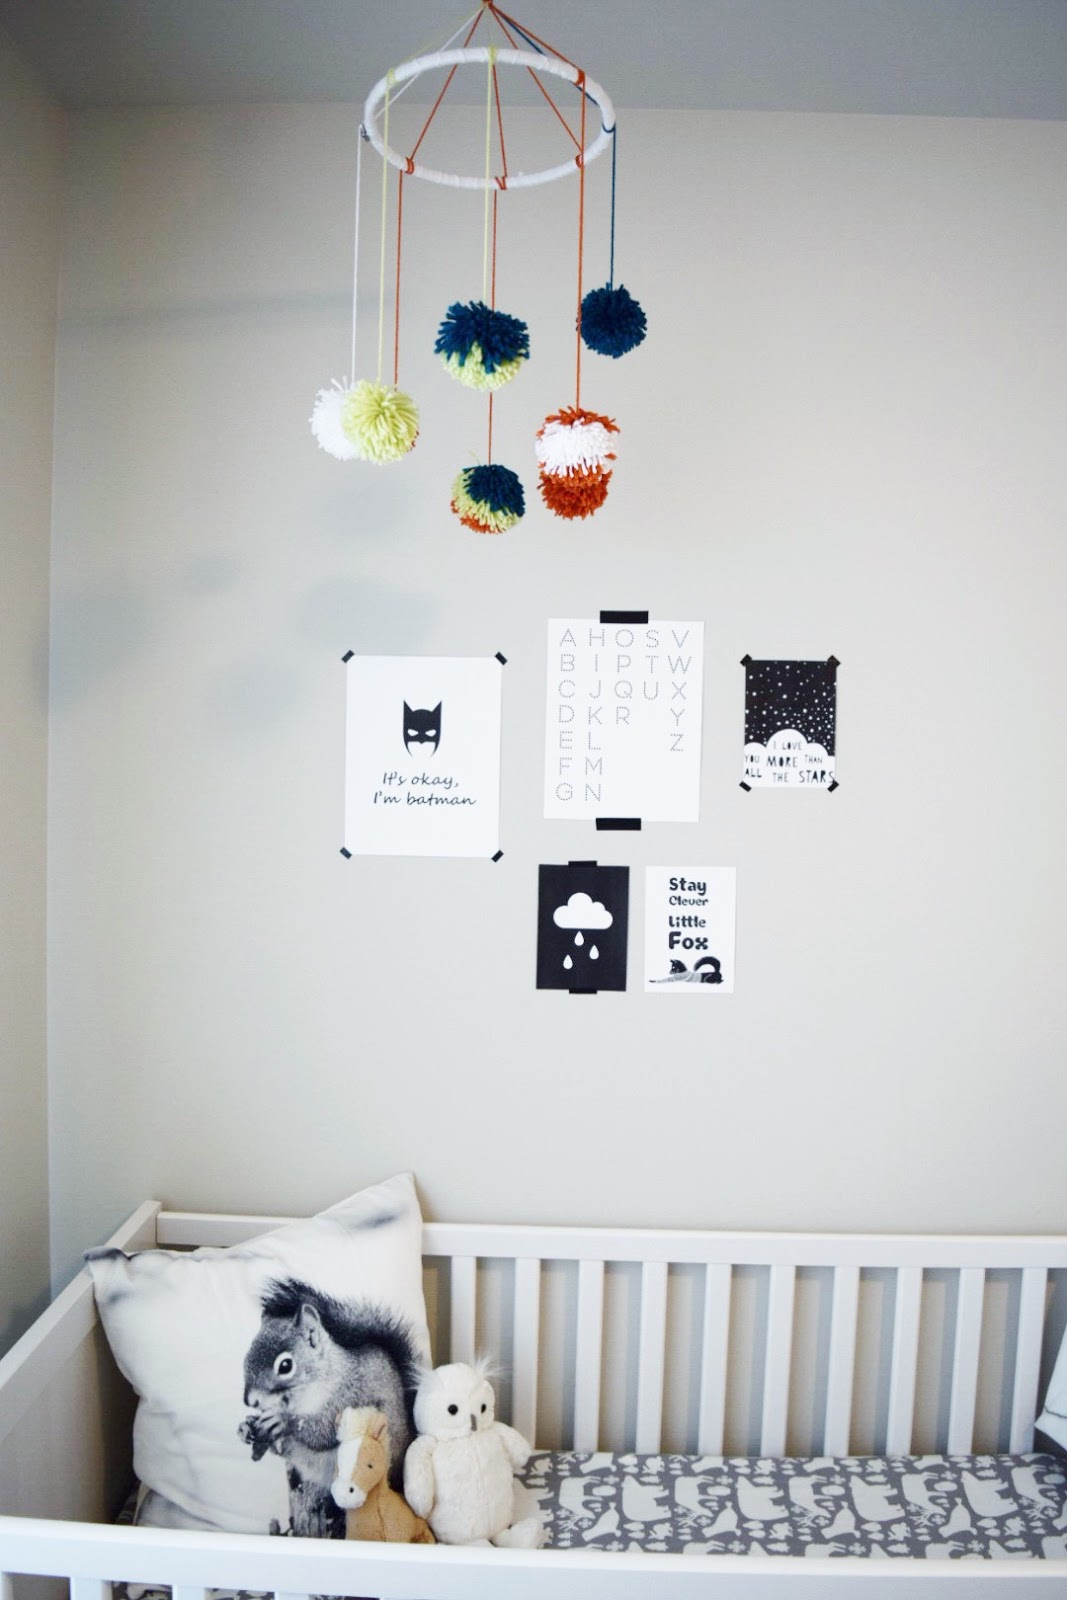 Crib: IKEA / Crib Sheet: Land of Nod / Crib Throw Pillow: IKEA / Stuffed  Animals: Jellycat / Baby Vest: Patagonia / Mobile: DIY / Wall Posters: